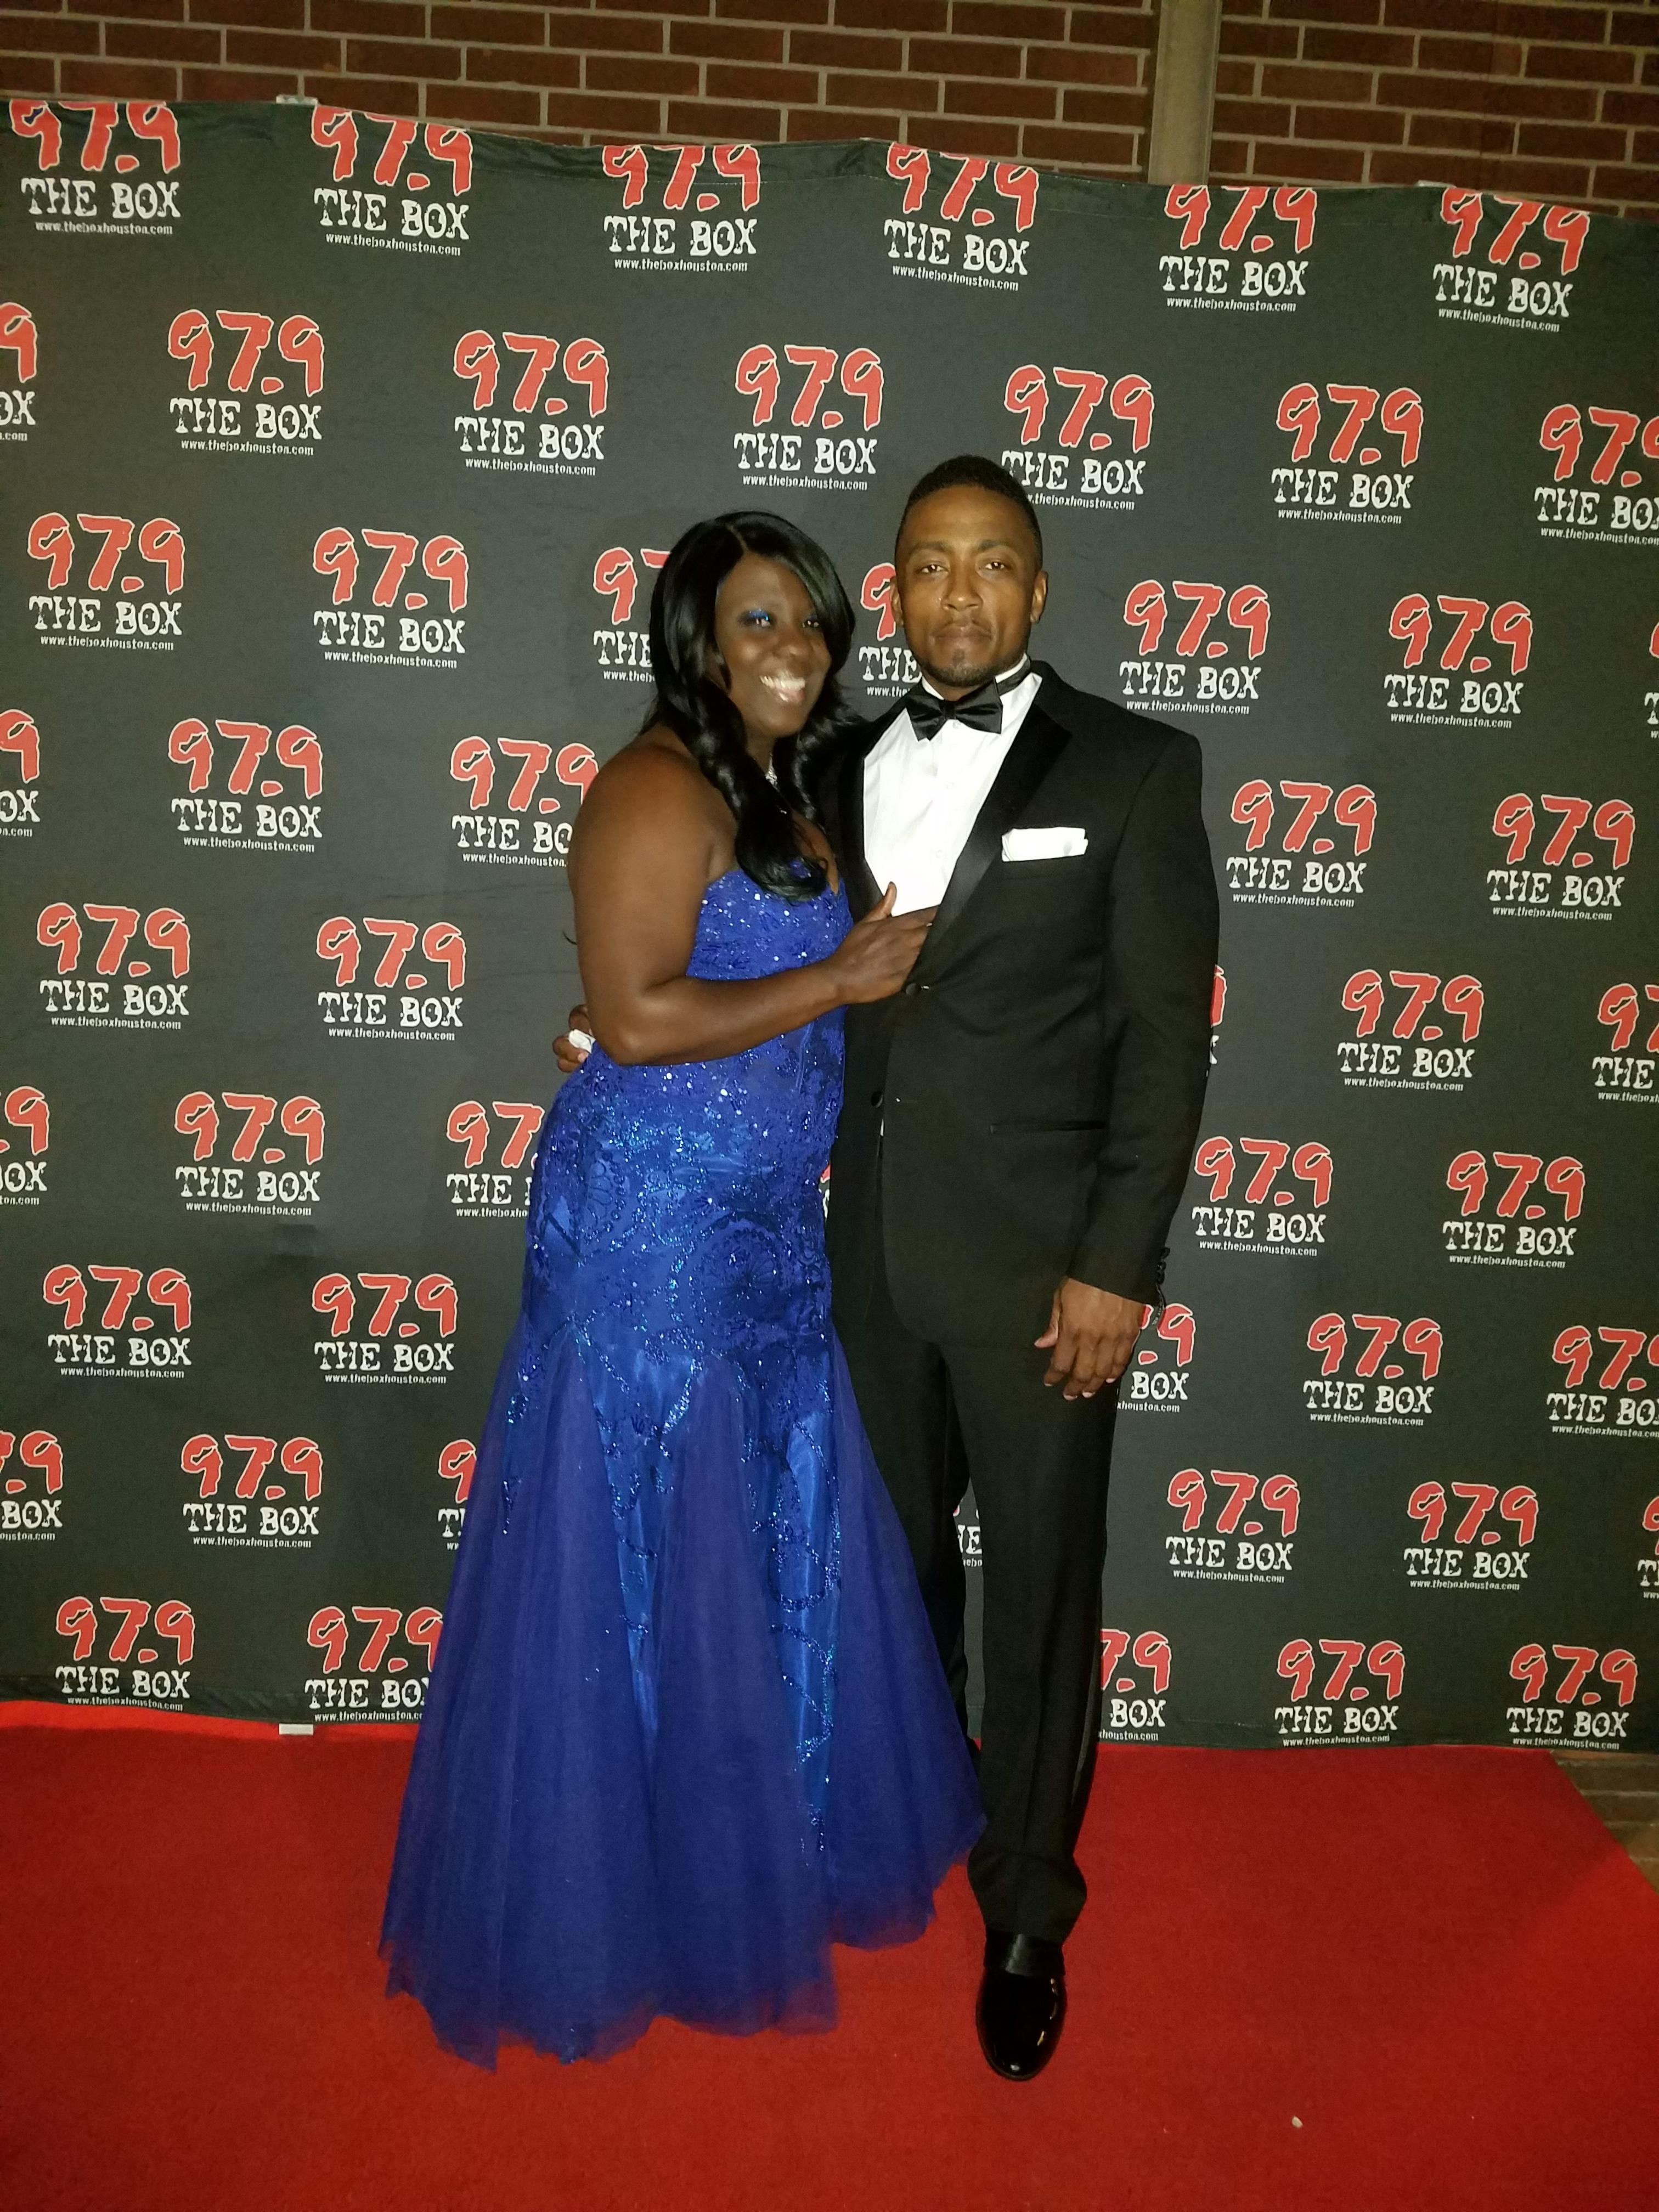 97.9 Prom Night Photo Gallery